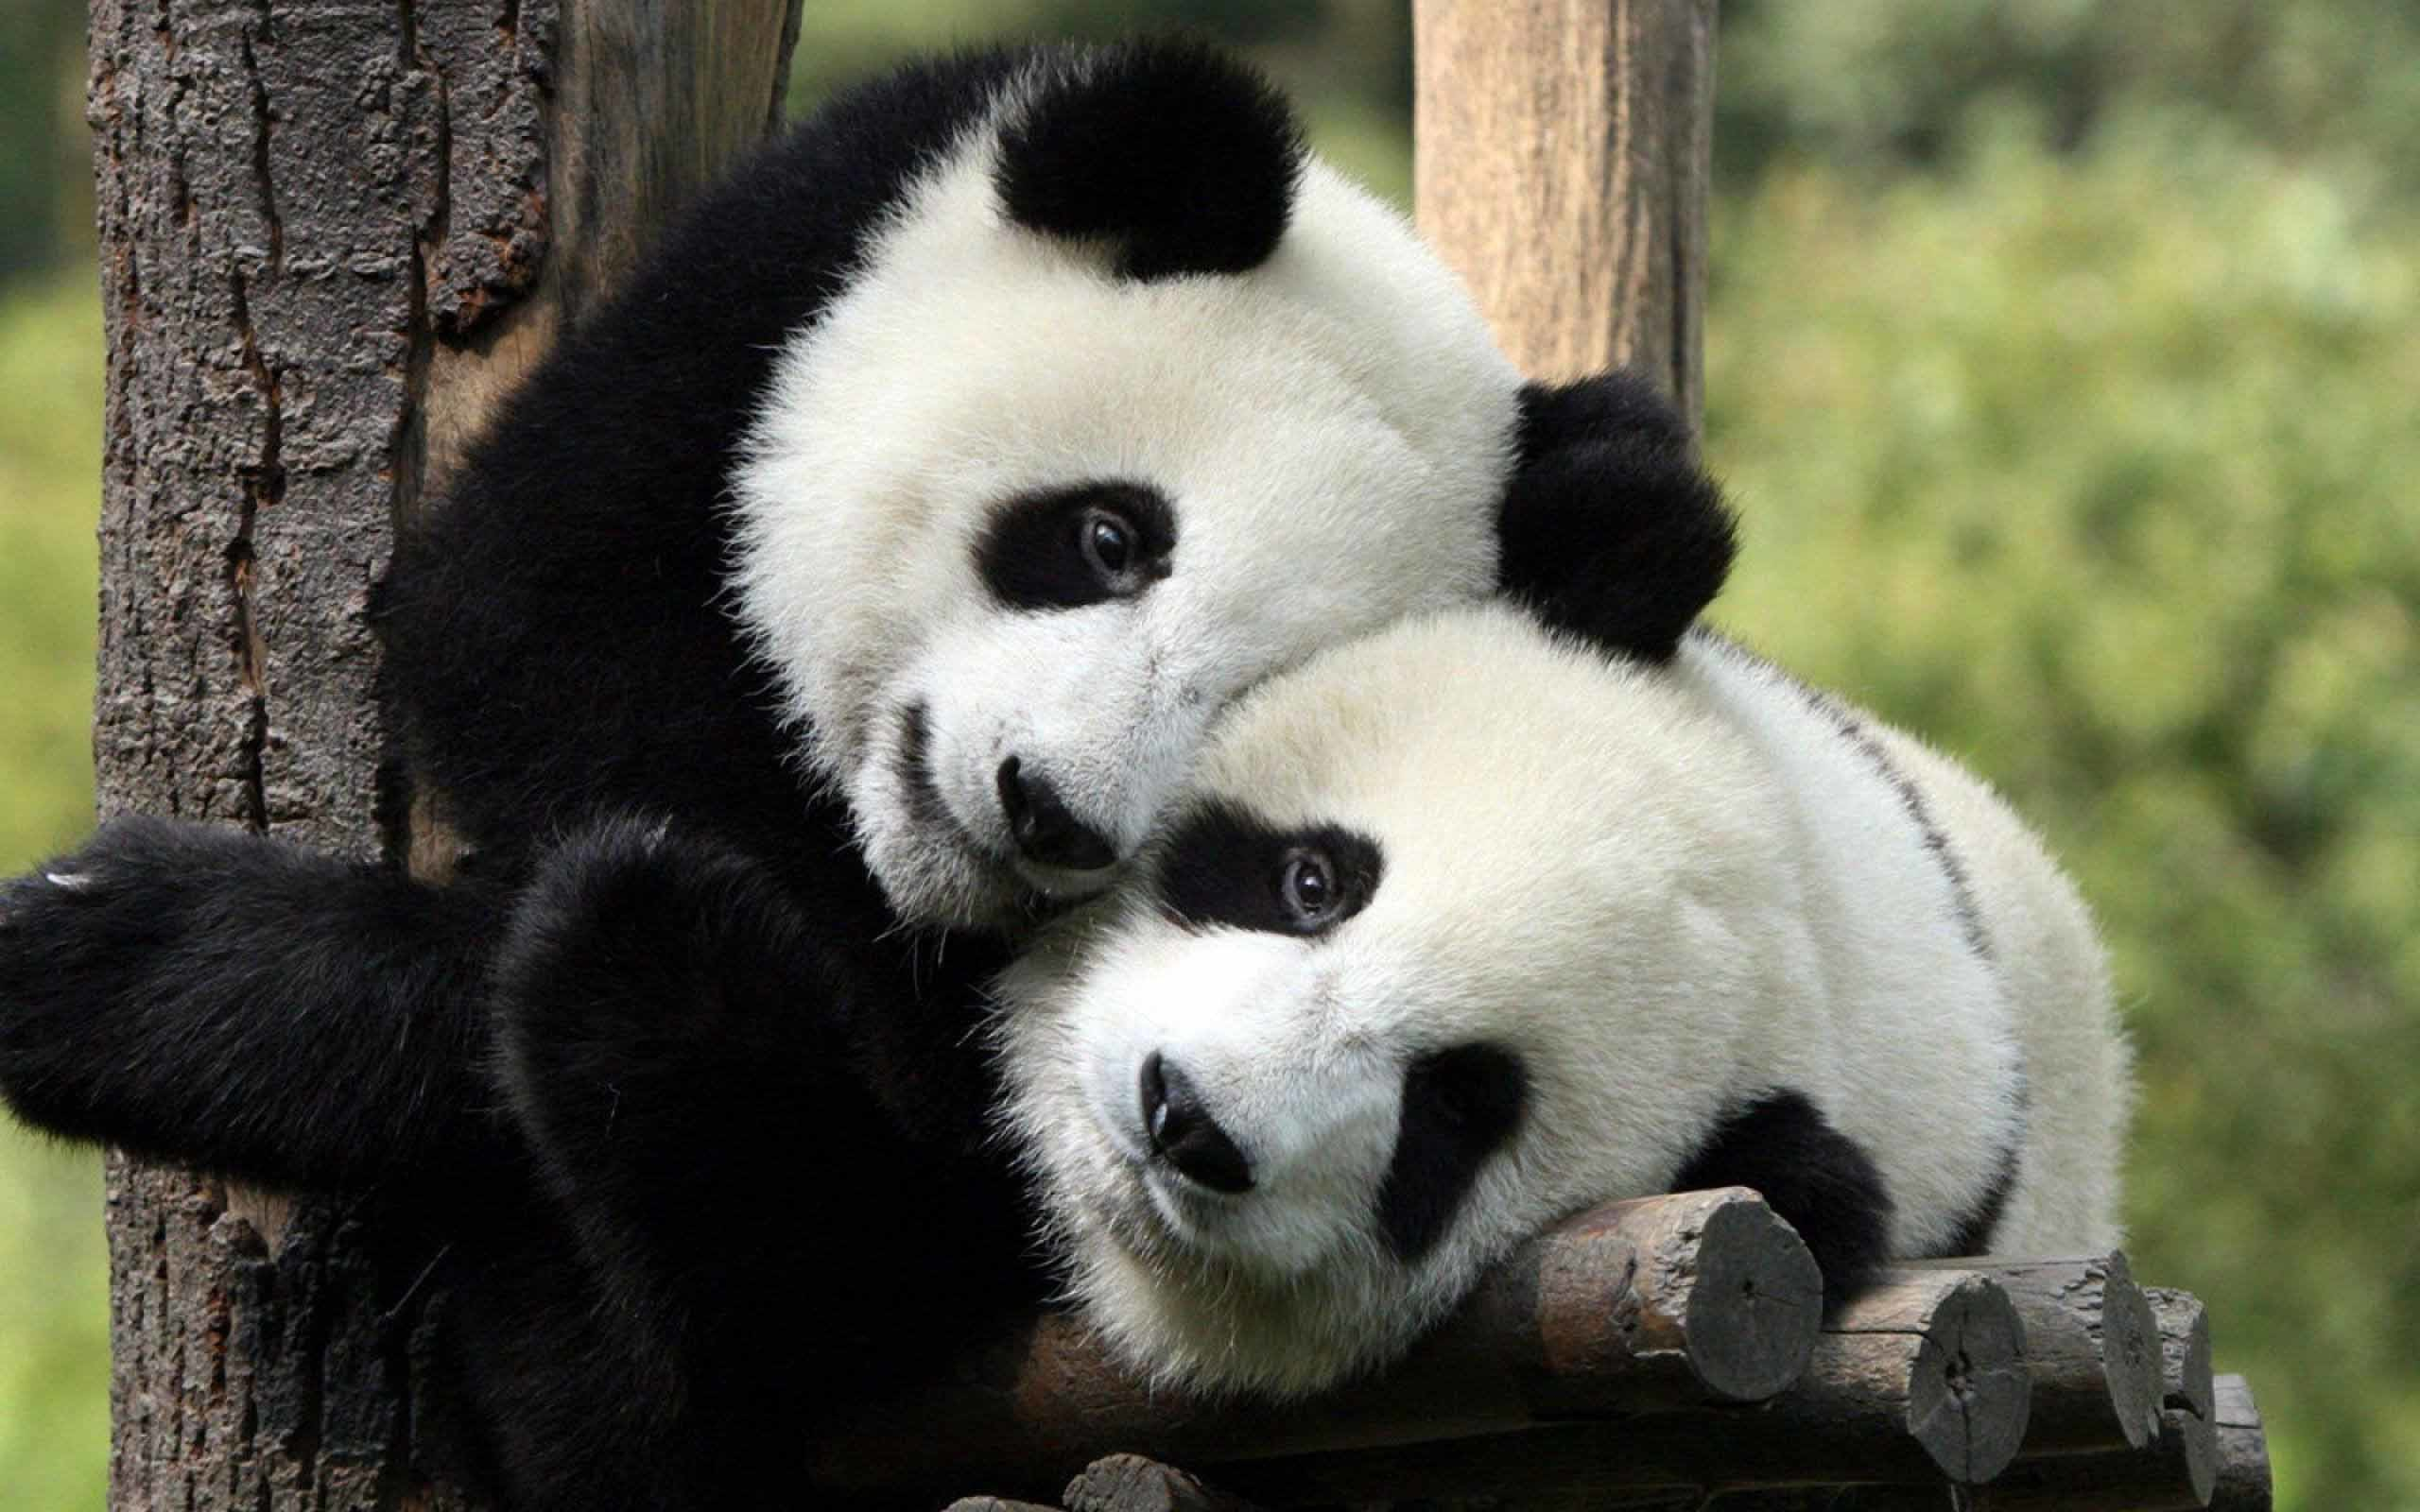 Giant panda animal love hd wallpaper download